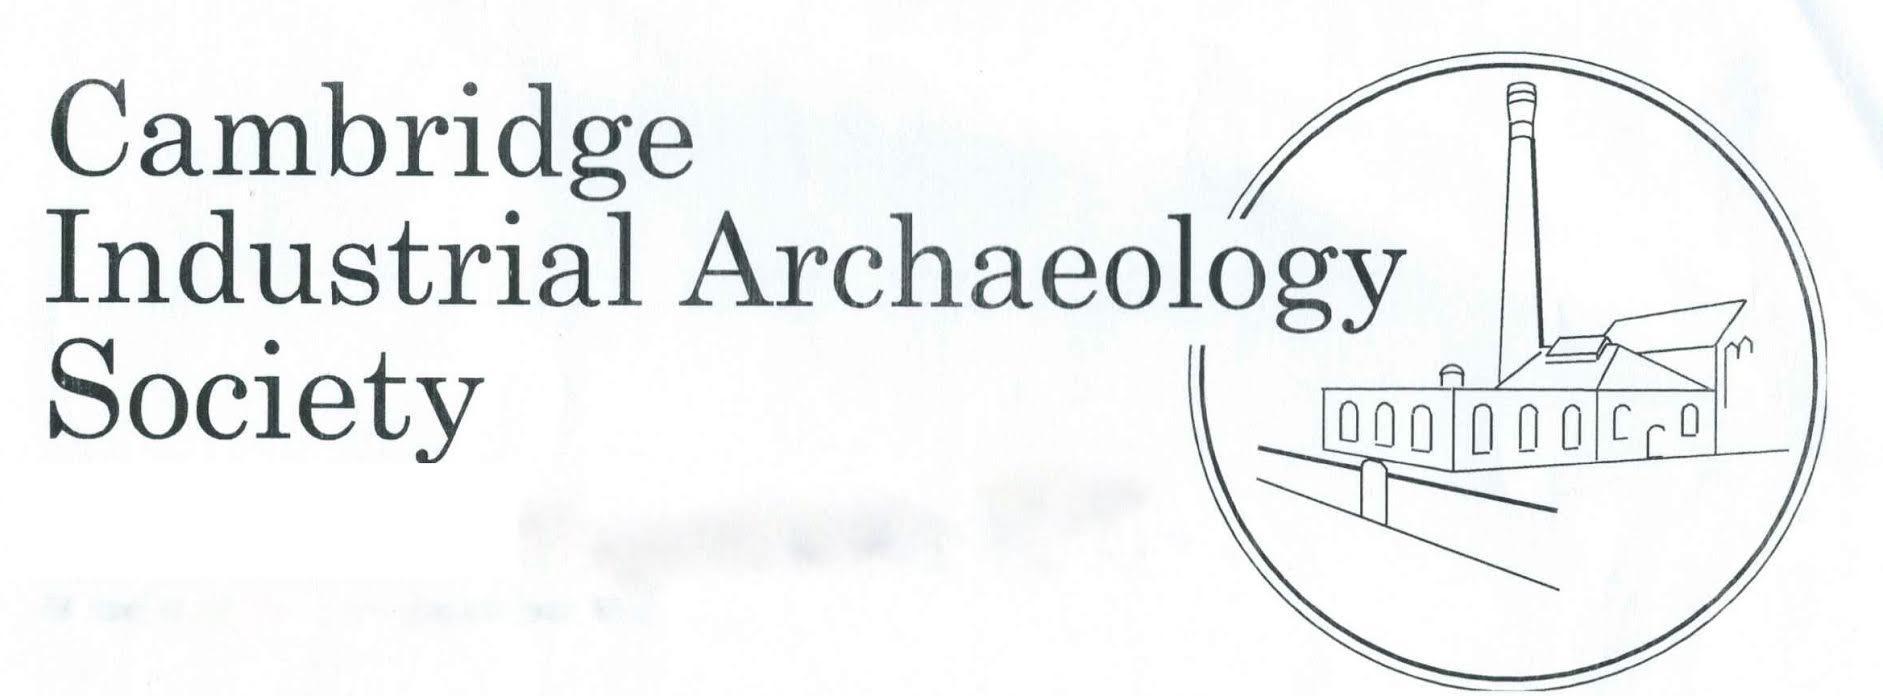 Cambridge Industrial Archaeology Society